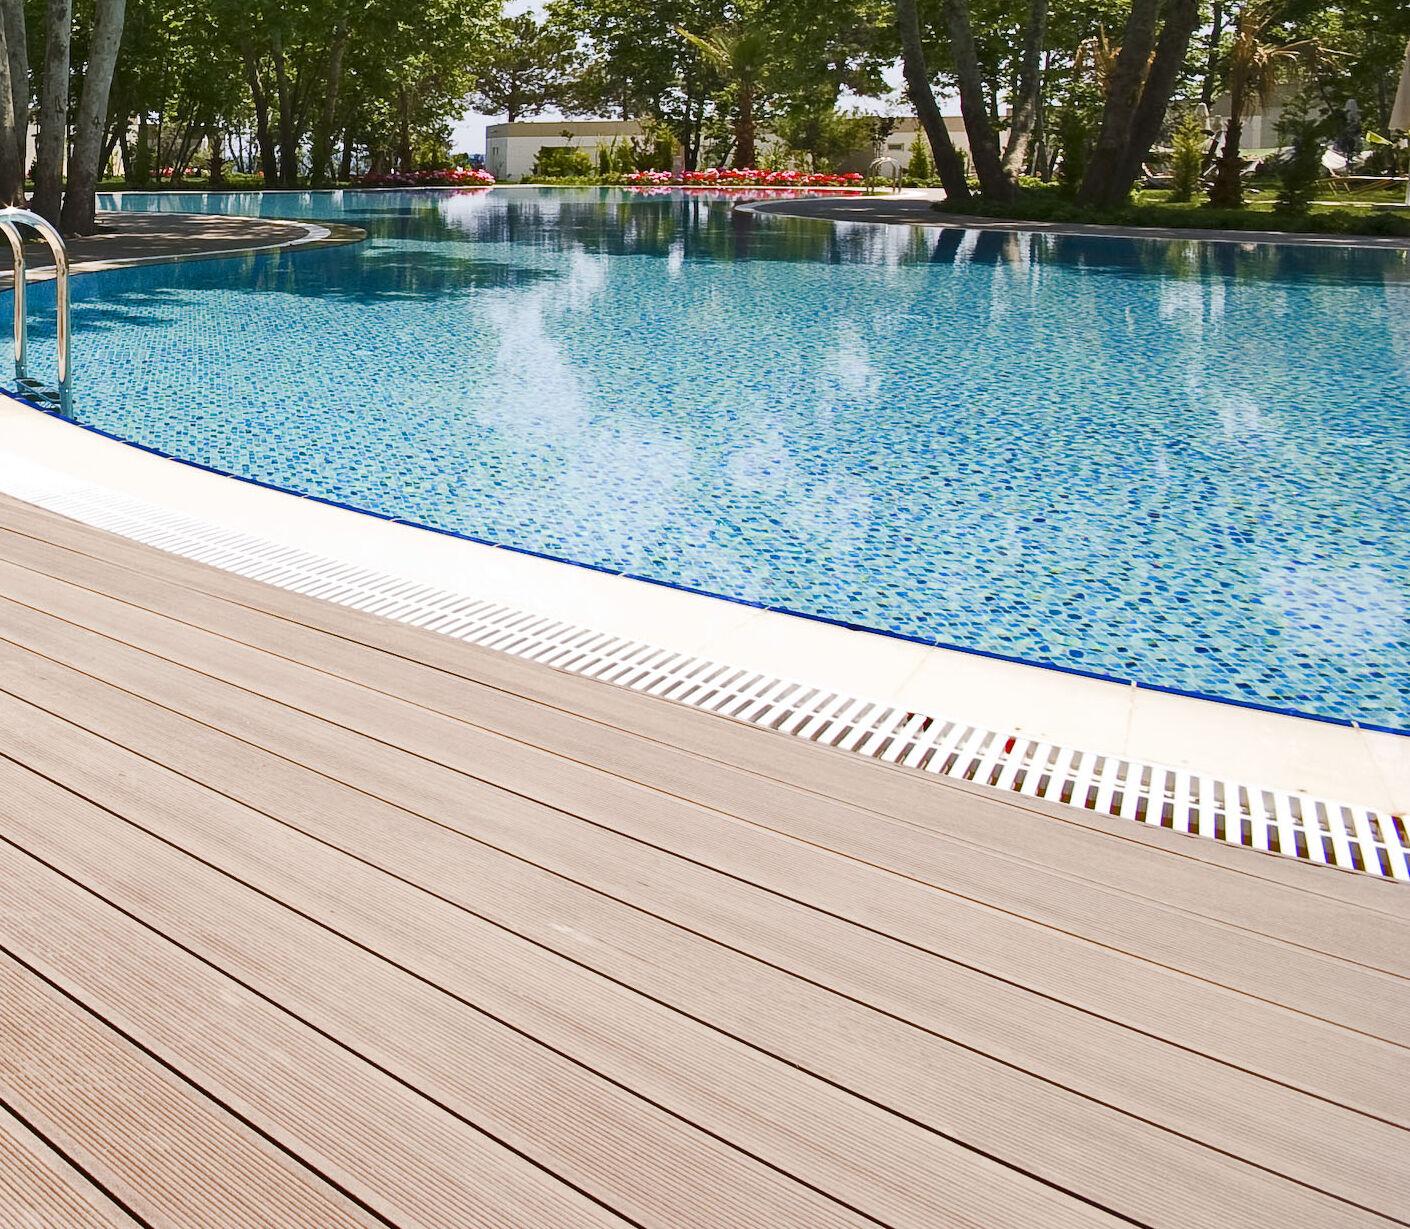 wpc terrassen dielen diele pool holz poolumrandung barfu diele steg zubeh r eur 1 00 picclick de. Black Bedroom Furniture Sets. Home Design Ideas